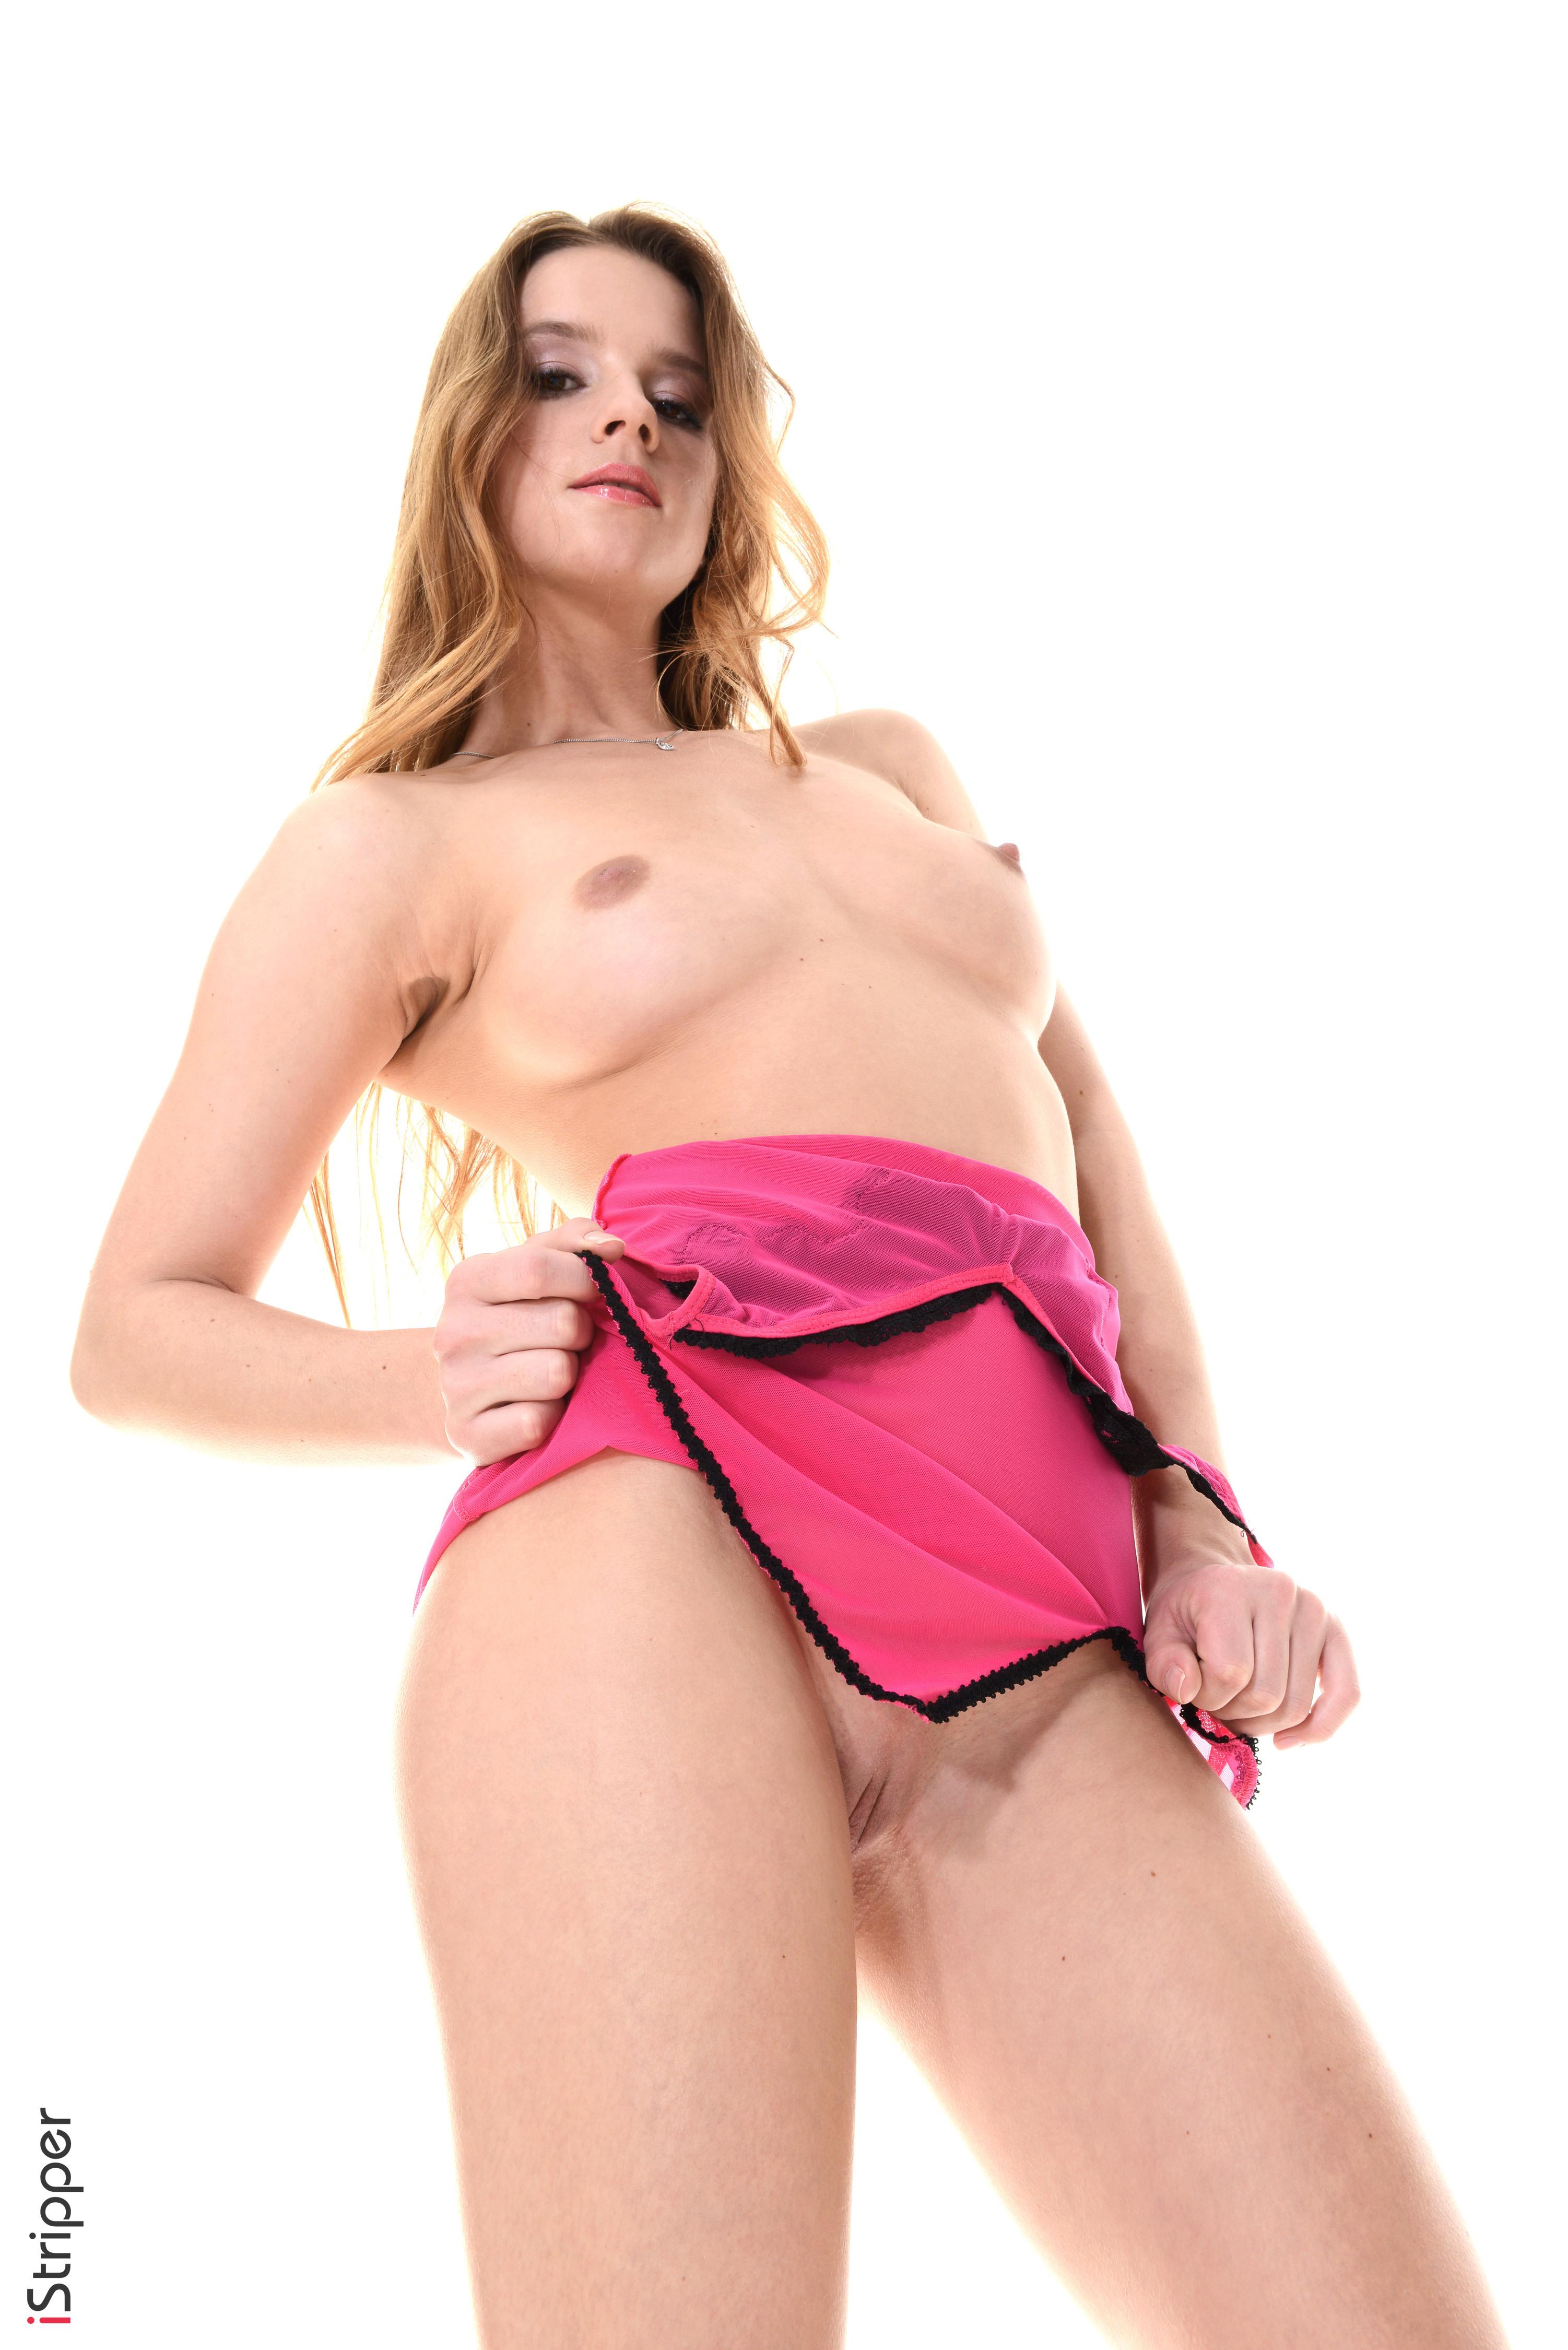 stripper on your desktop app